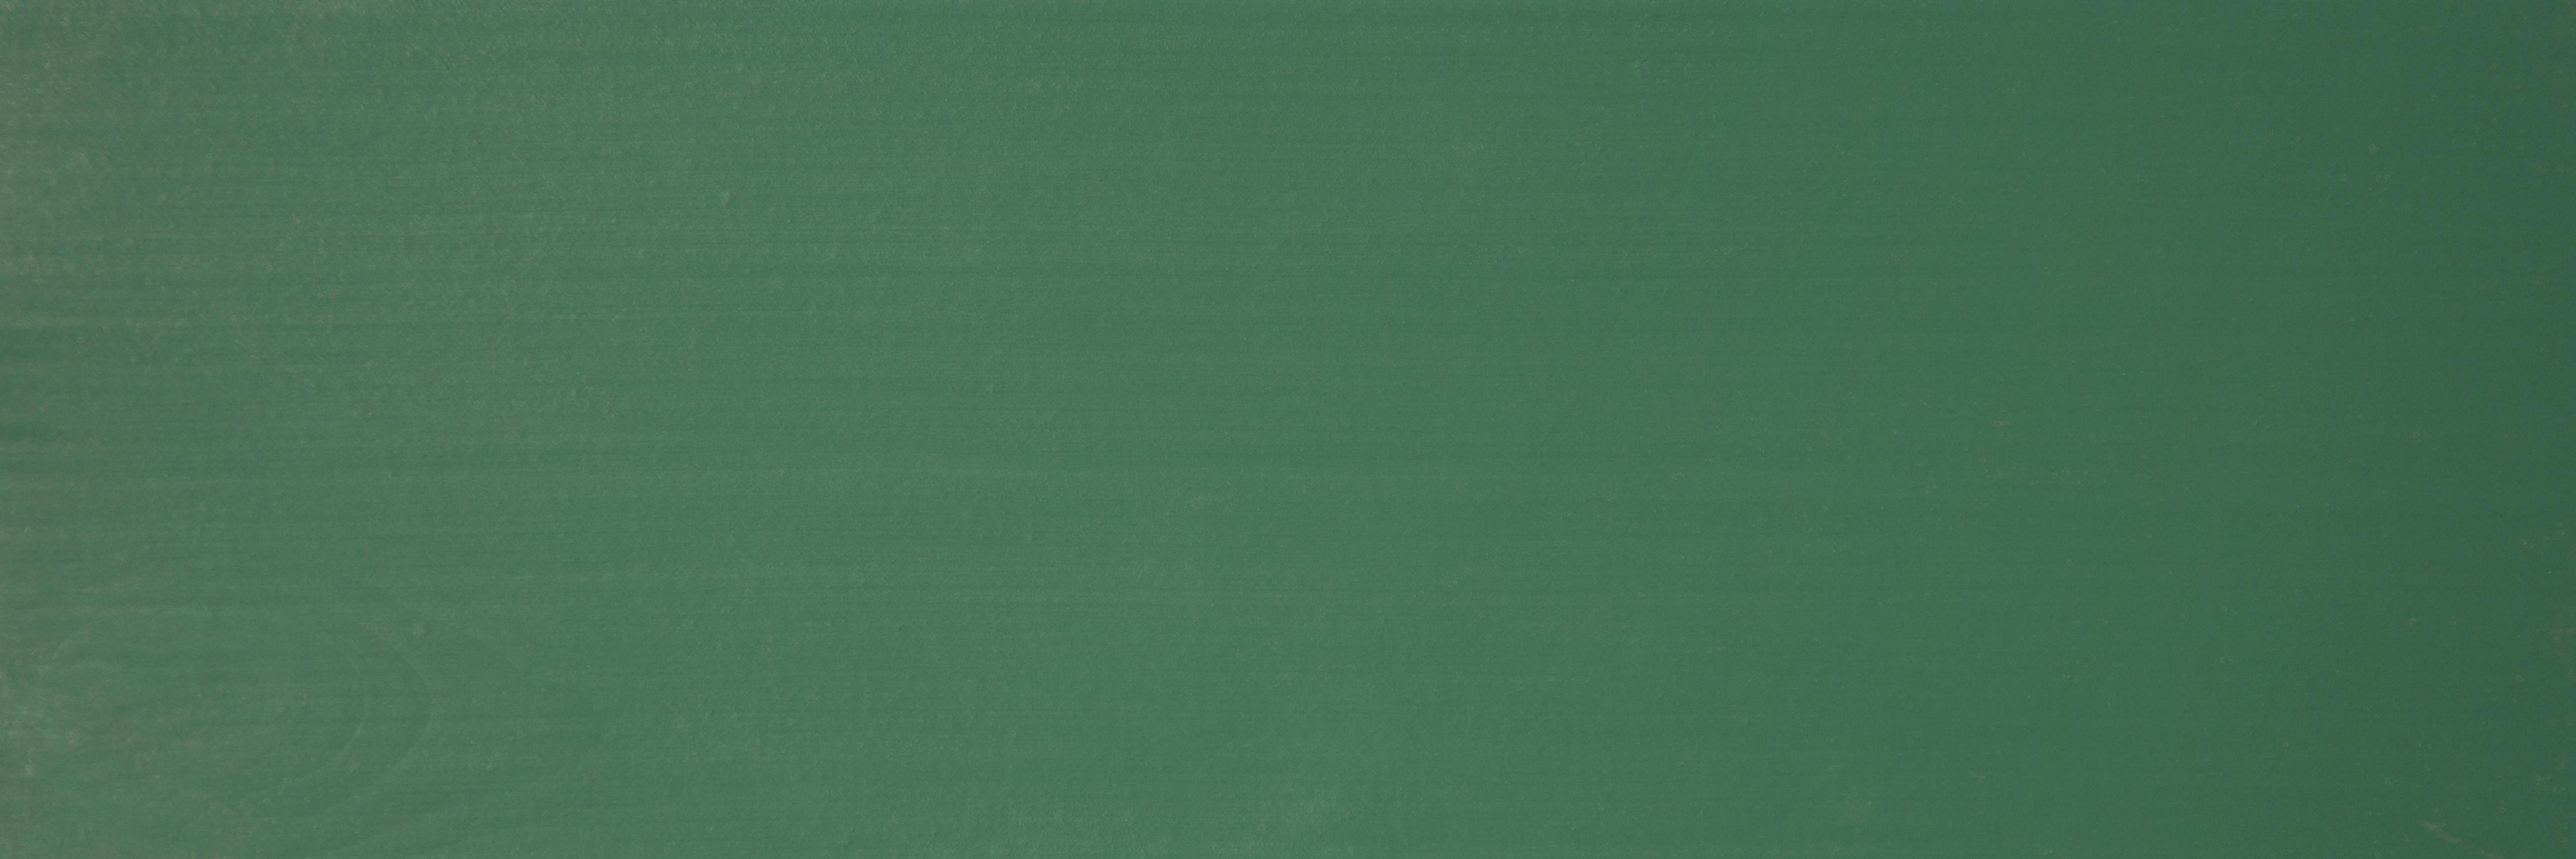 NCL-06 | Pine green